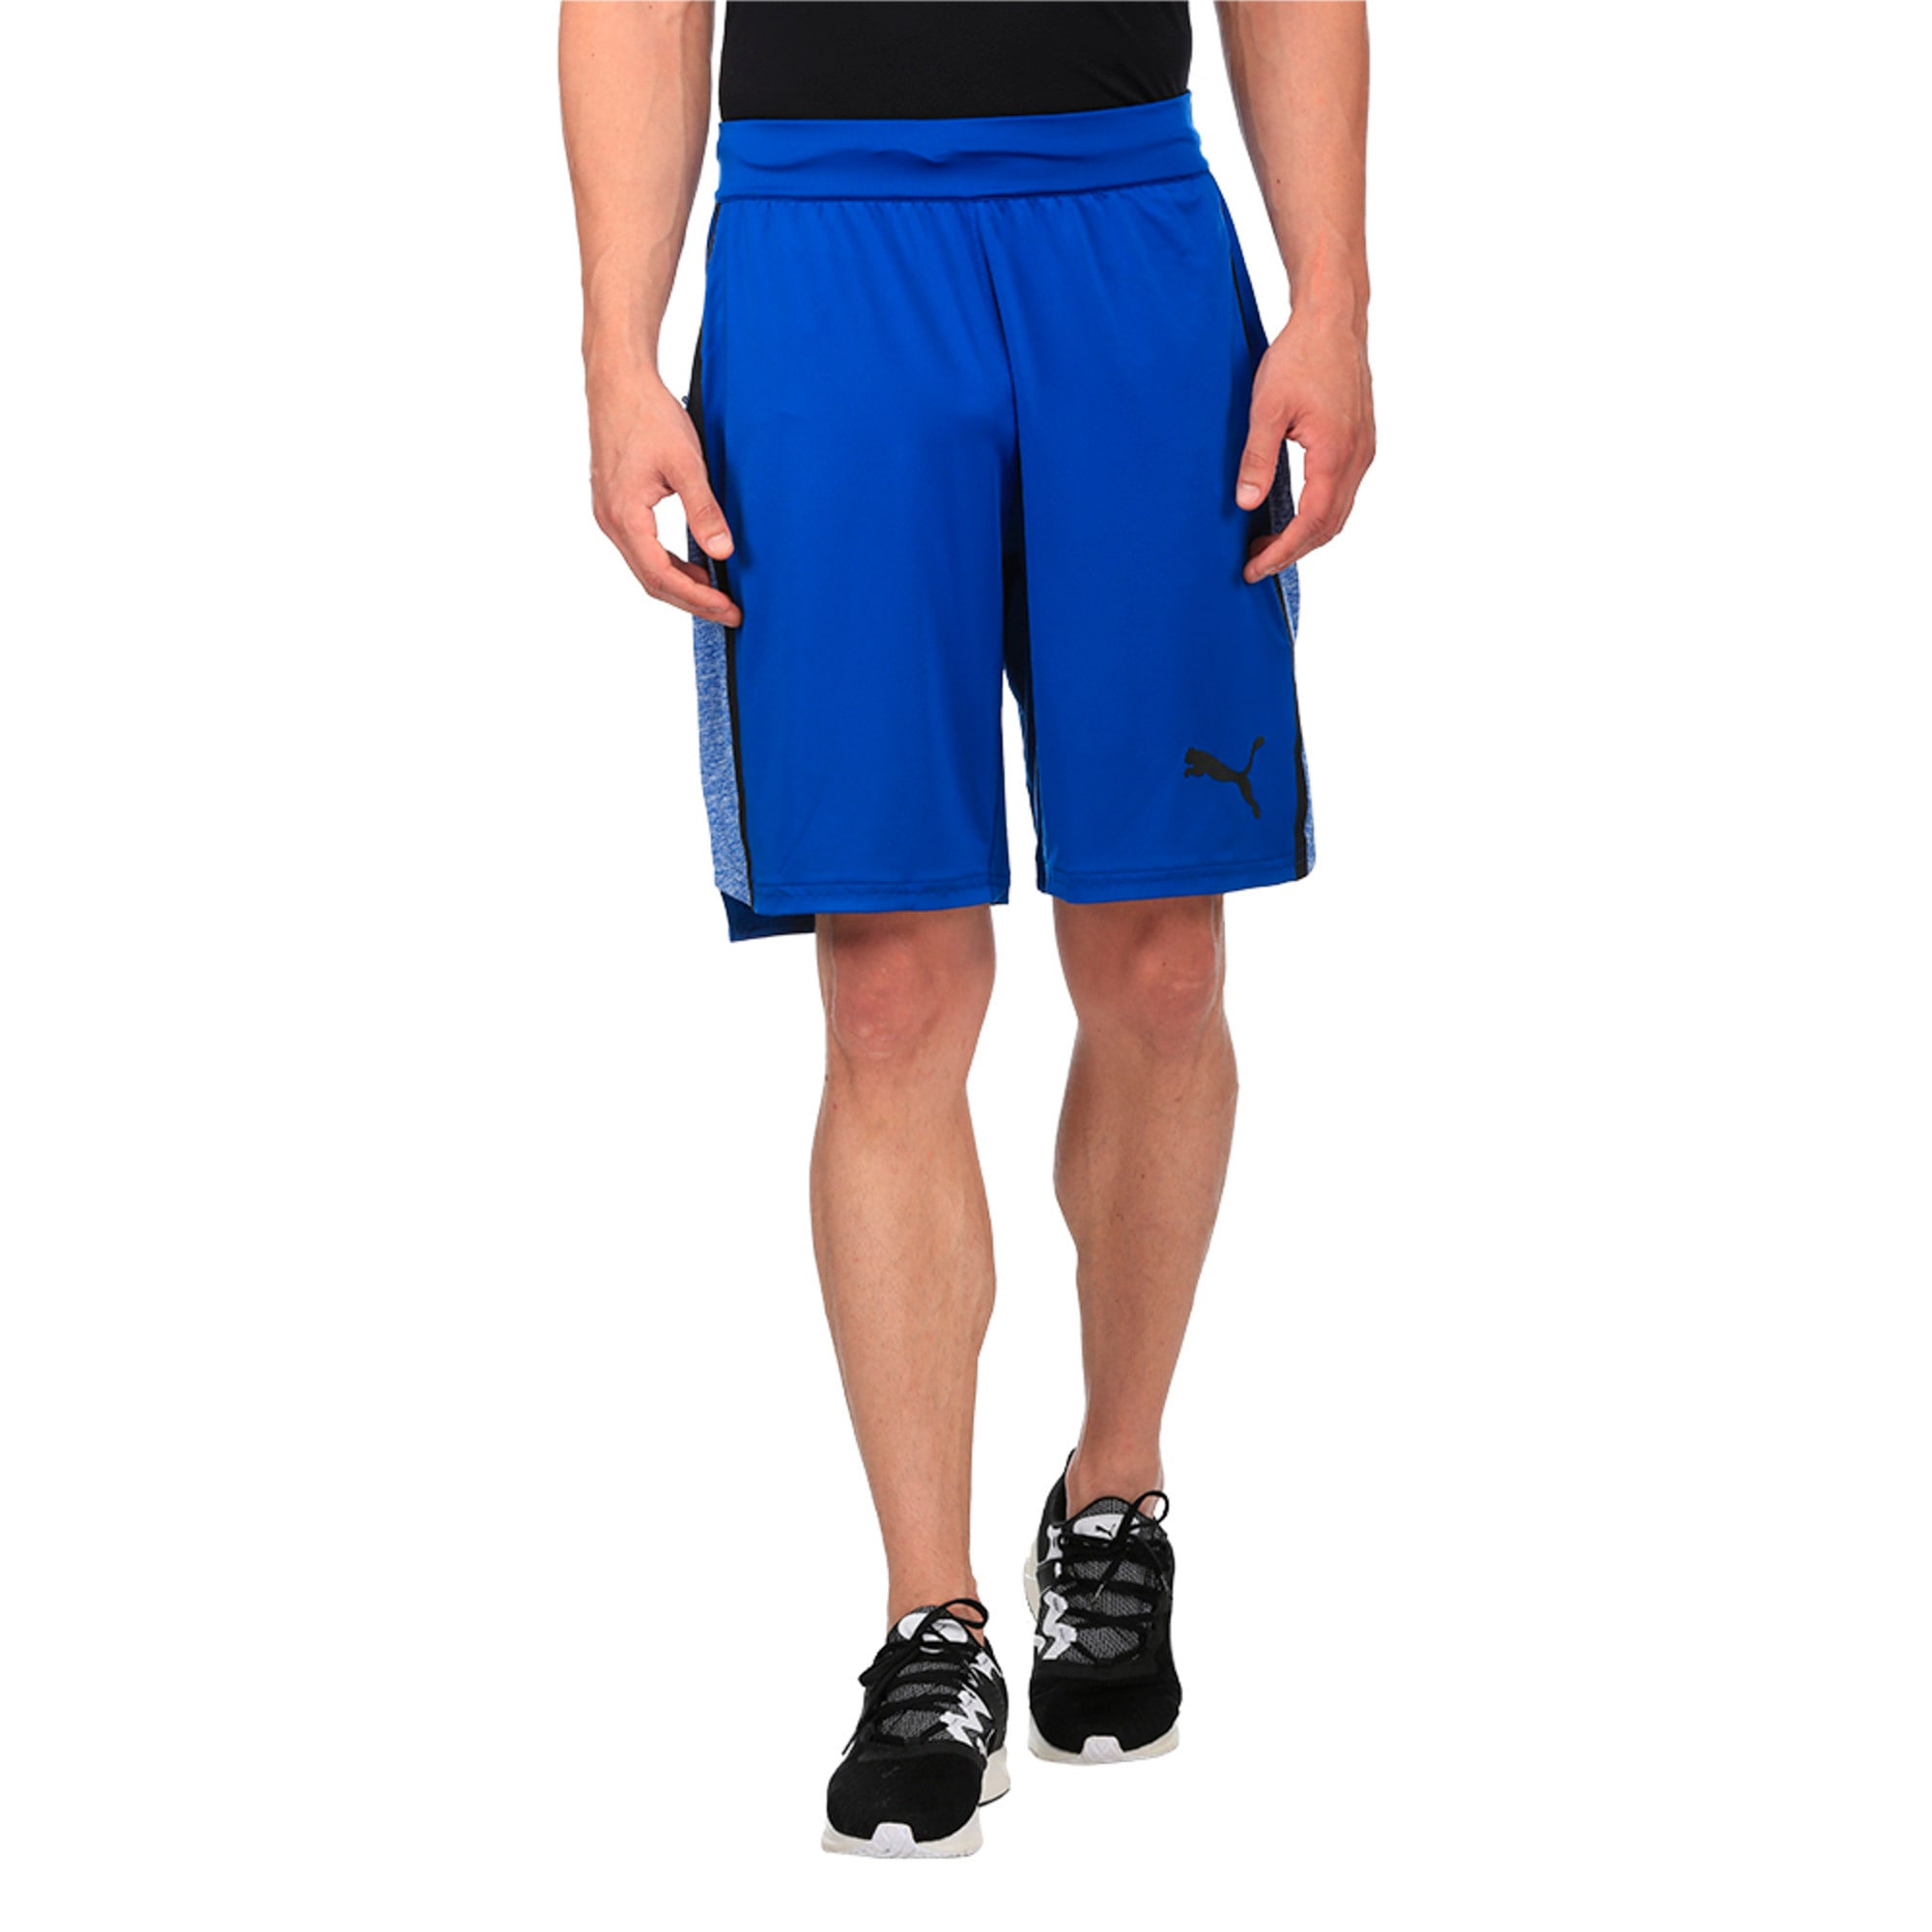 Thumbnail 5 of Active Training Men's Bonded Tech Shorts, TRUE BLUE-TRUE BLUE Heather, medium-IND